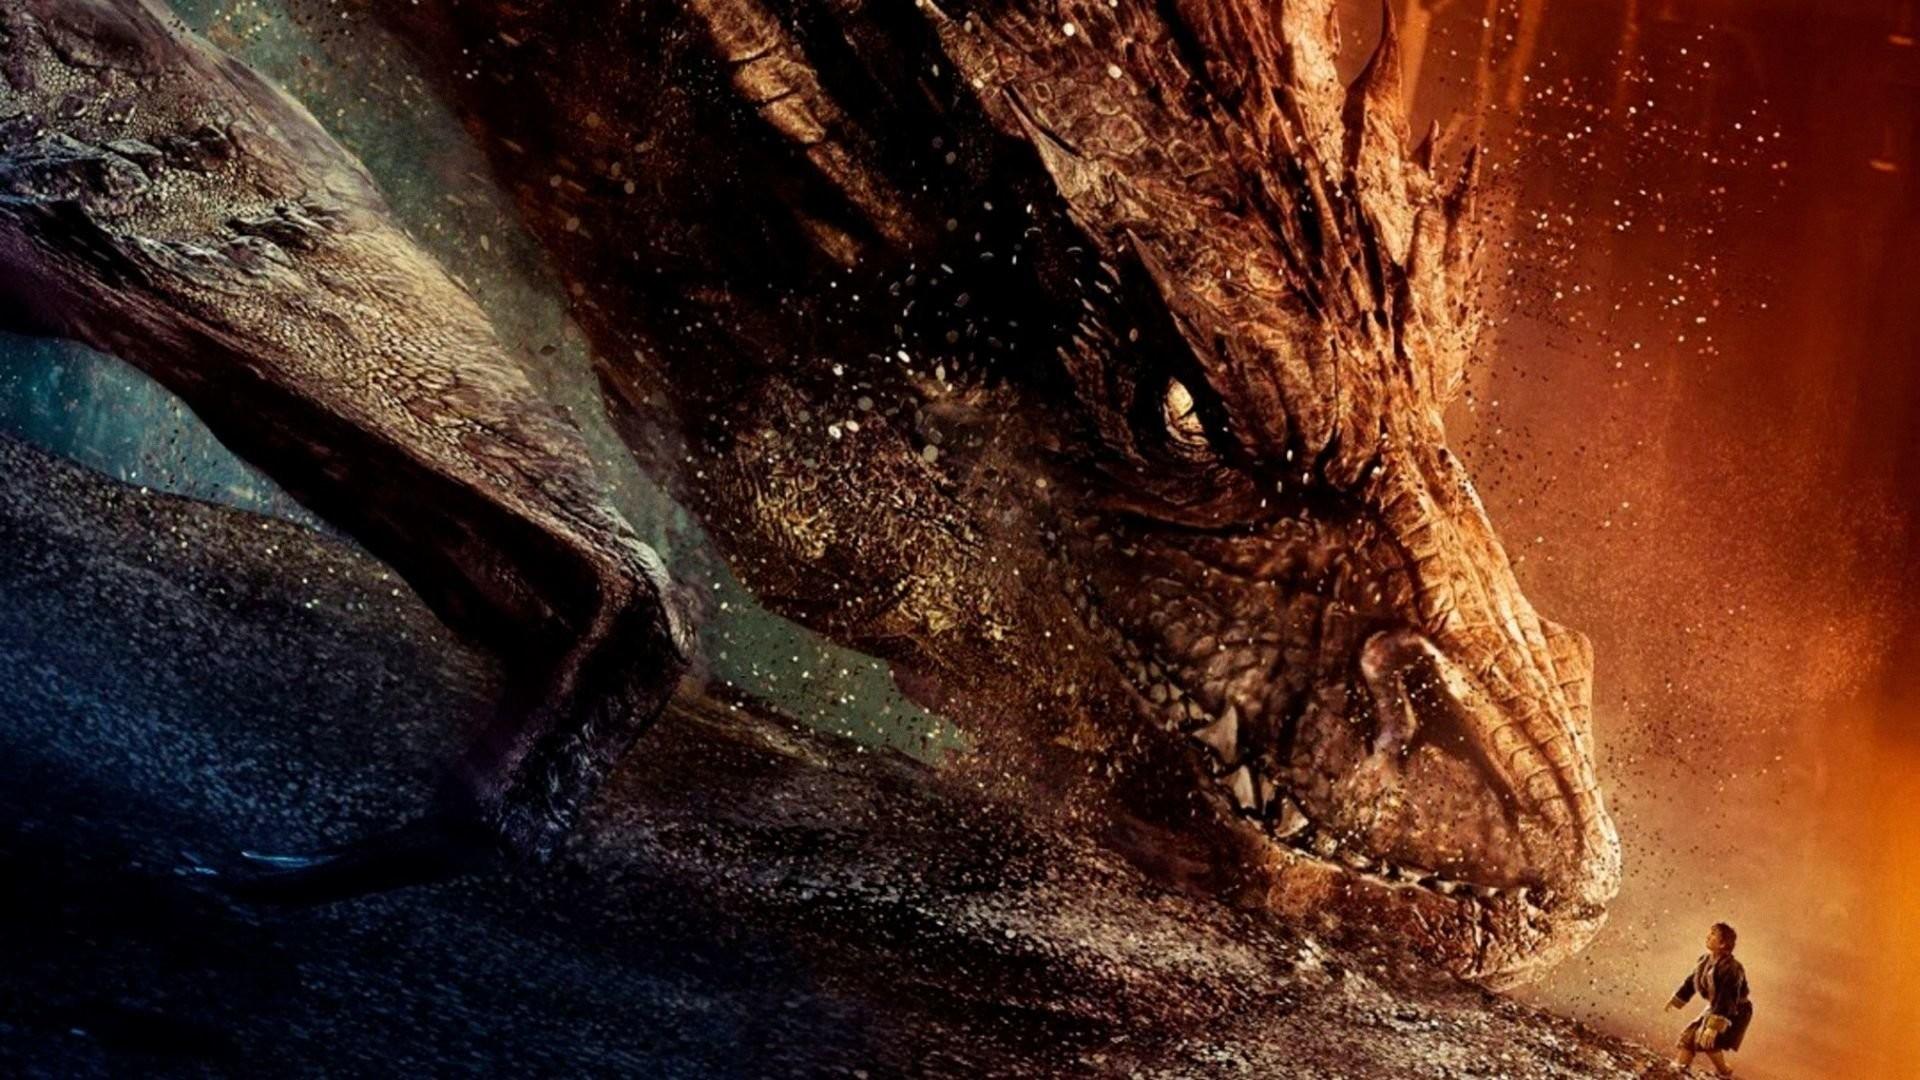 Movie – The Hobbit: The Desolation of Smaug Dragon Wallpaper